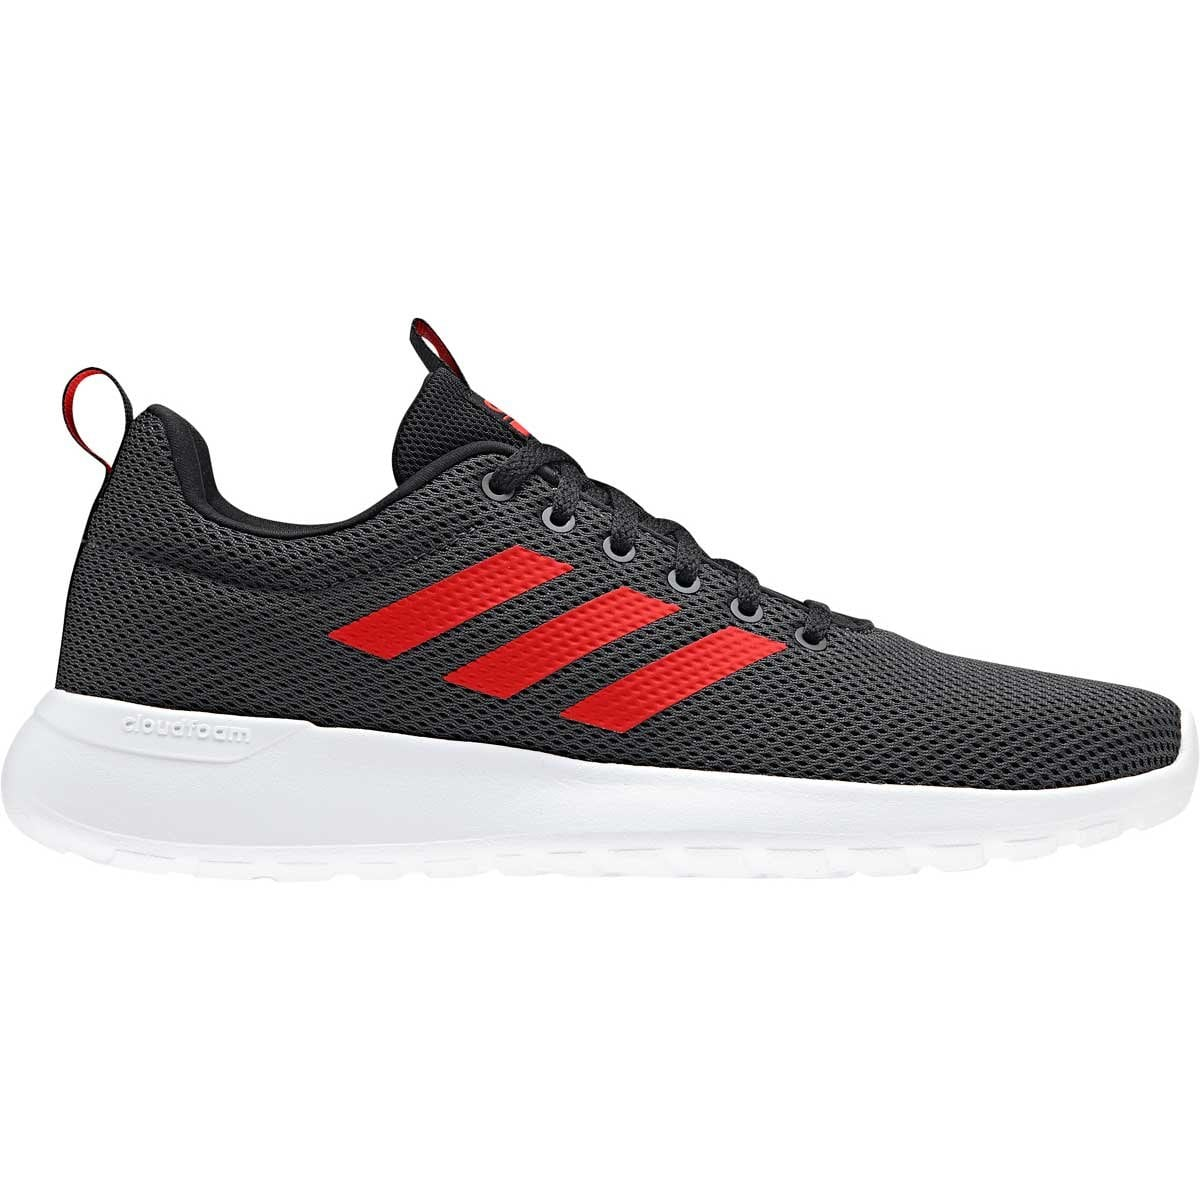 Tenis Running Lite Racer Cln Adidas - Caballero